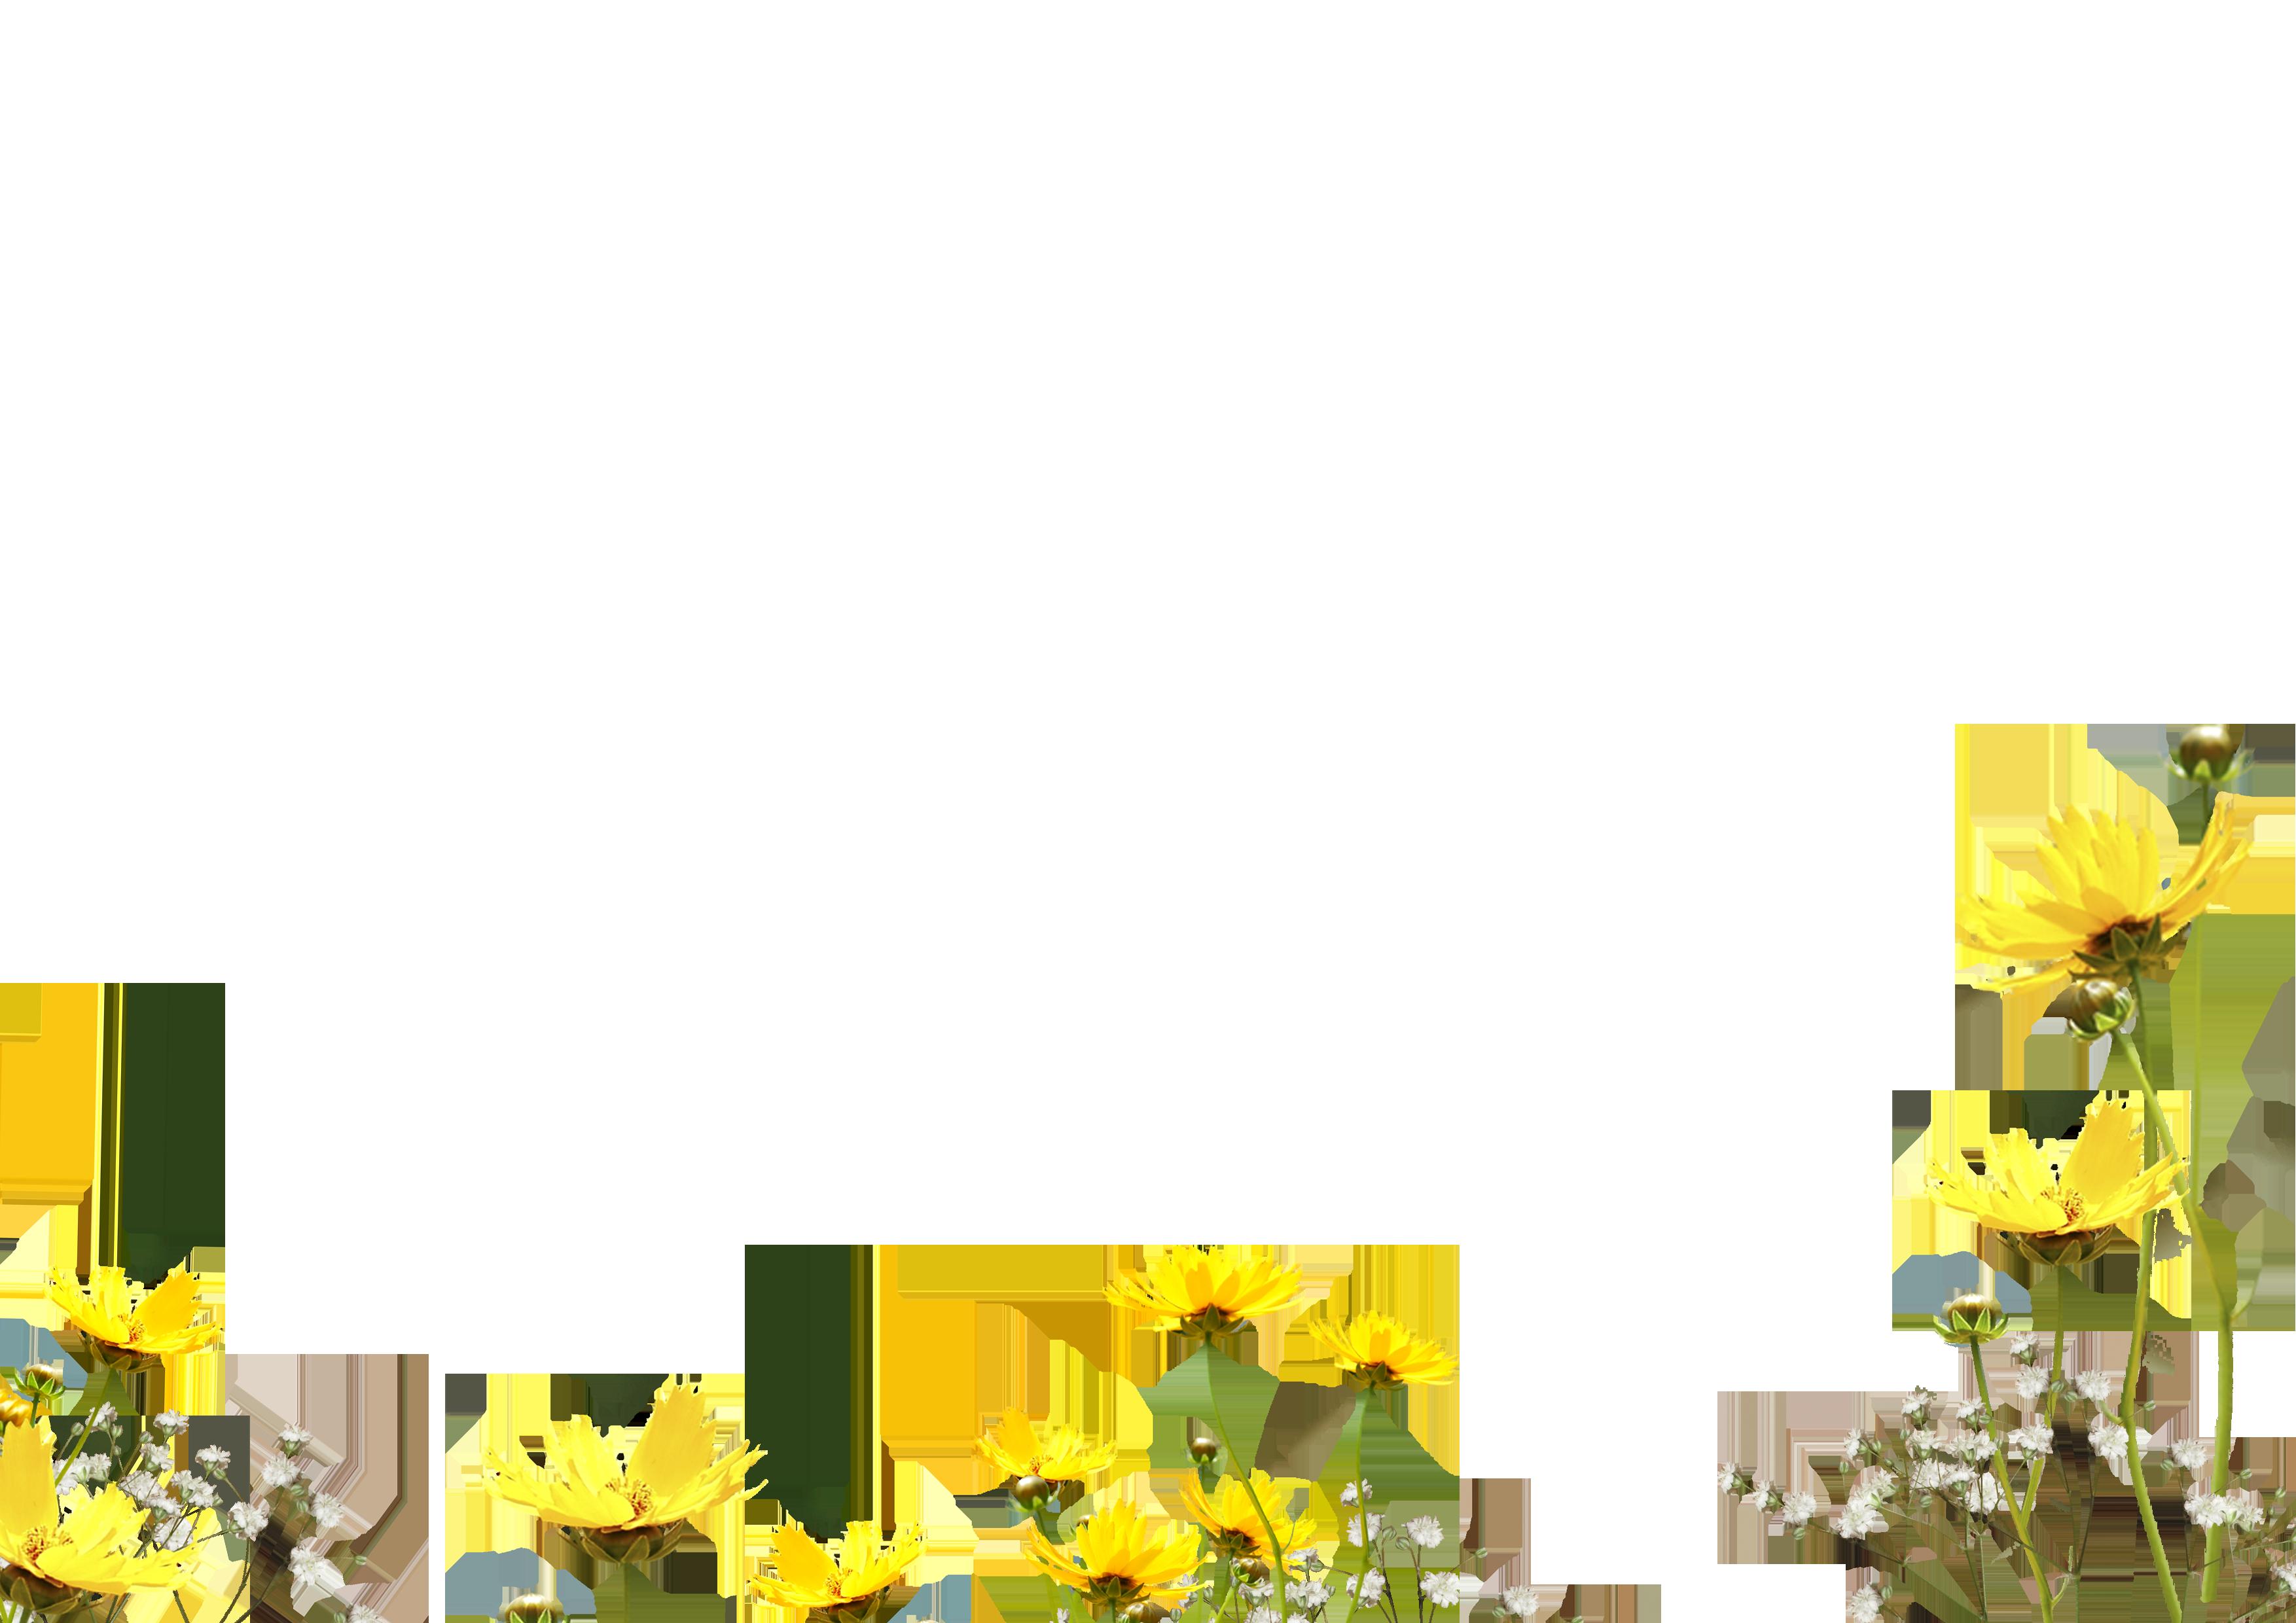 Free Flower Photo Overlay Photoshop Overlays From Mroverlay Photoshop Overlays Photo Overlays Desktop Wallpaper Art